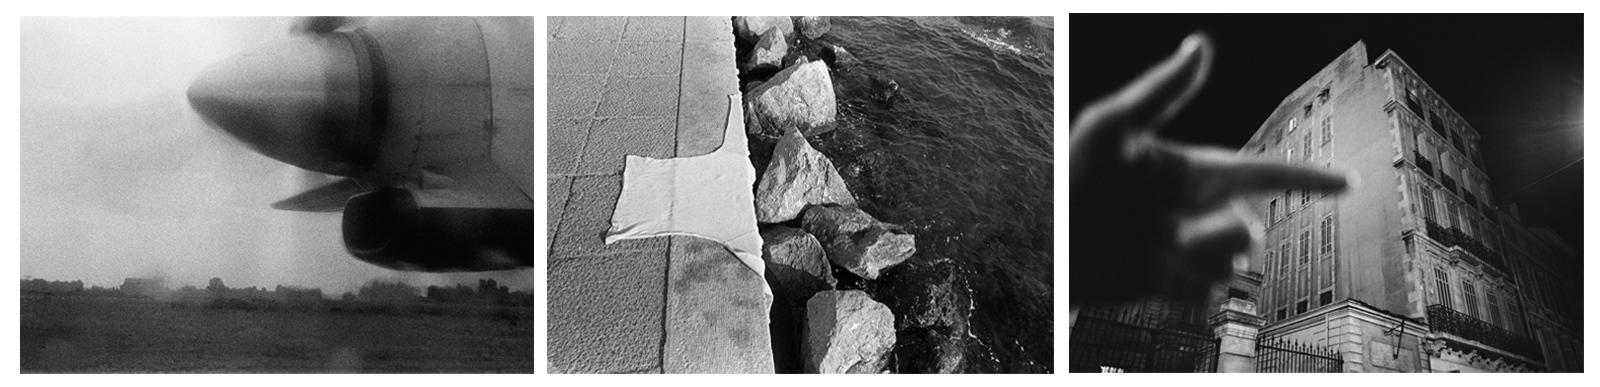 Art and Documentary Photography - Loading 03_Marseille___Fabio_Sgroi.jpg